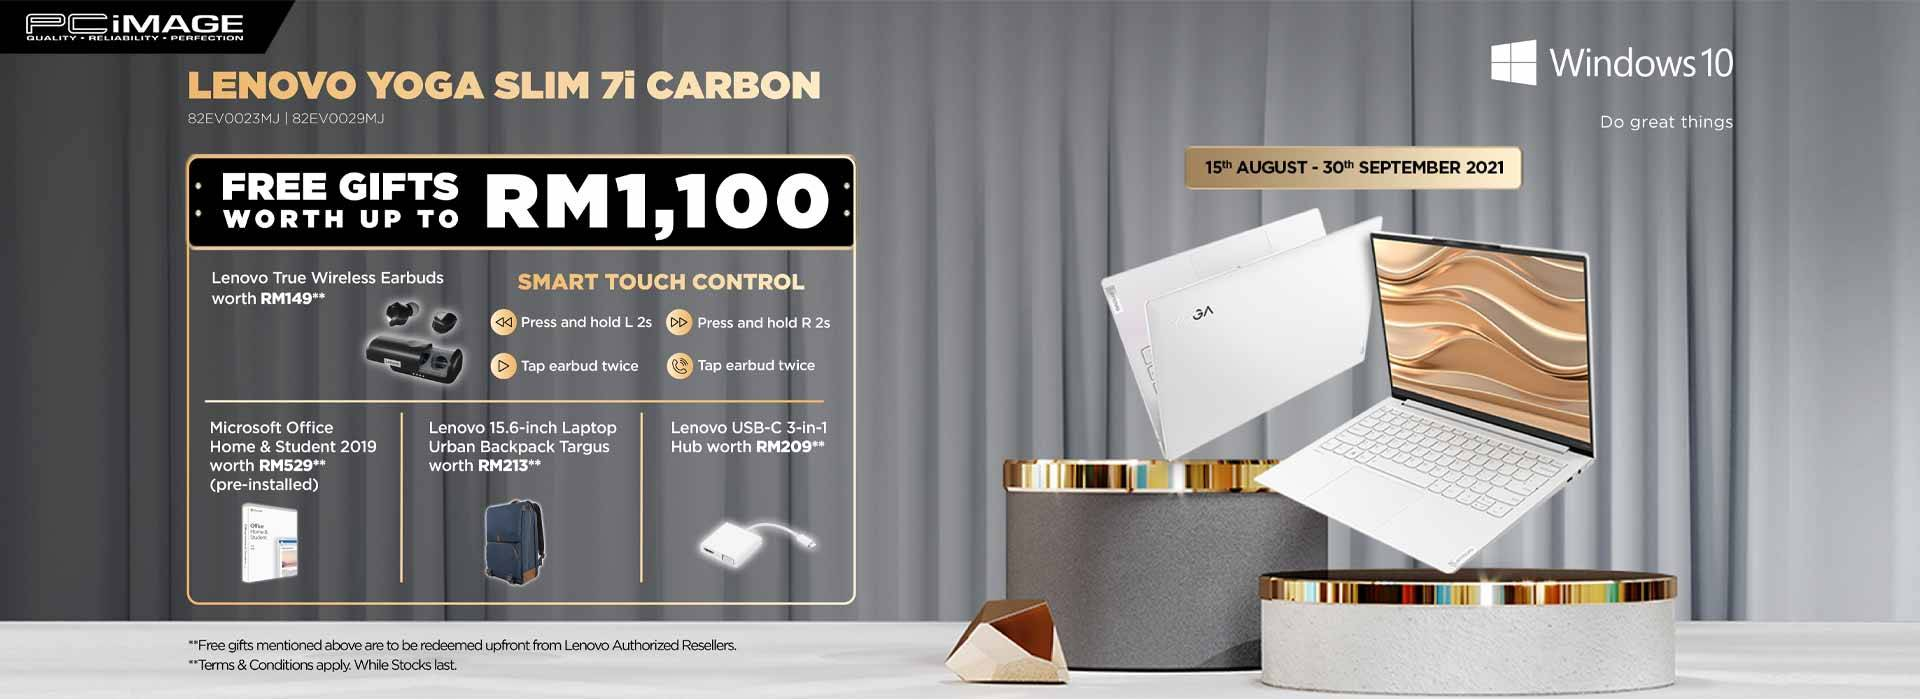 Lenovo Yoga Slim Promo 30 Sept